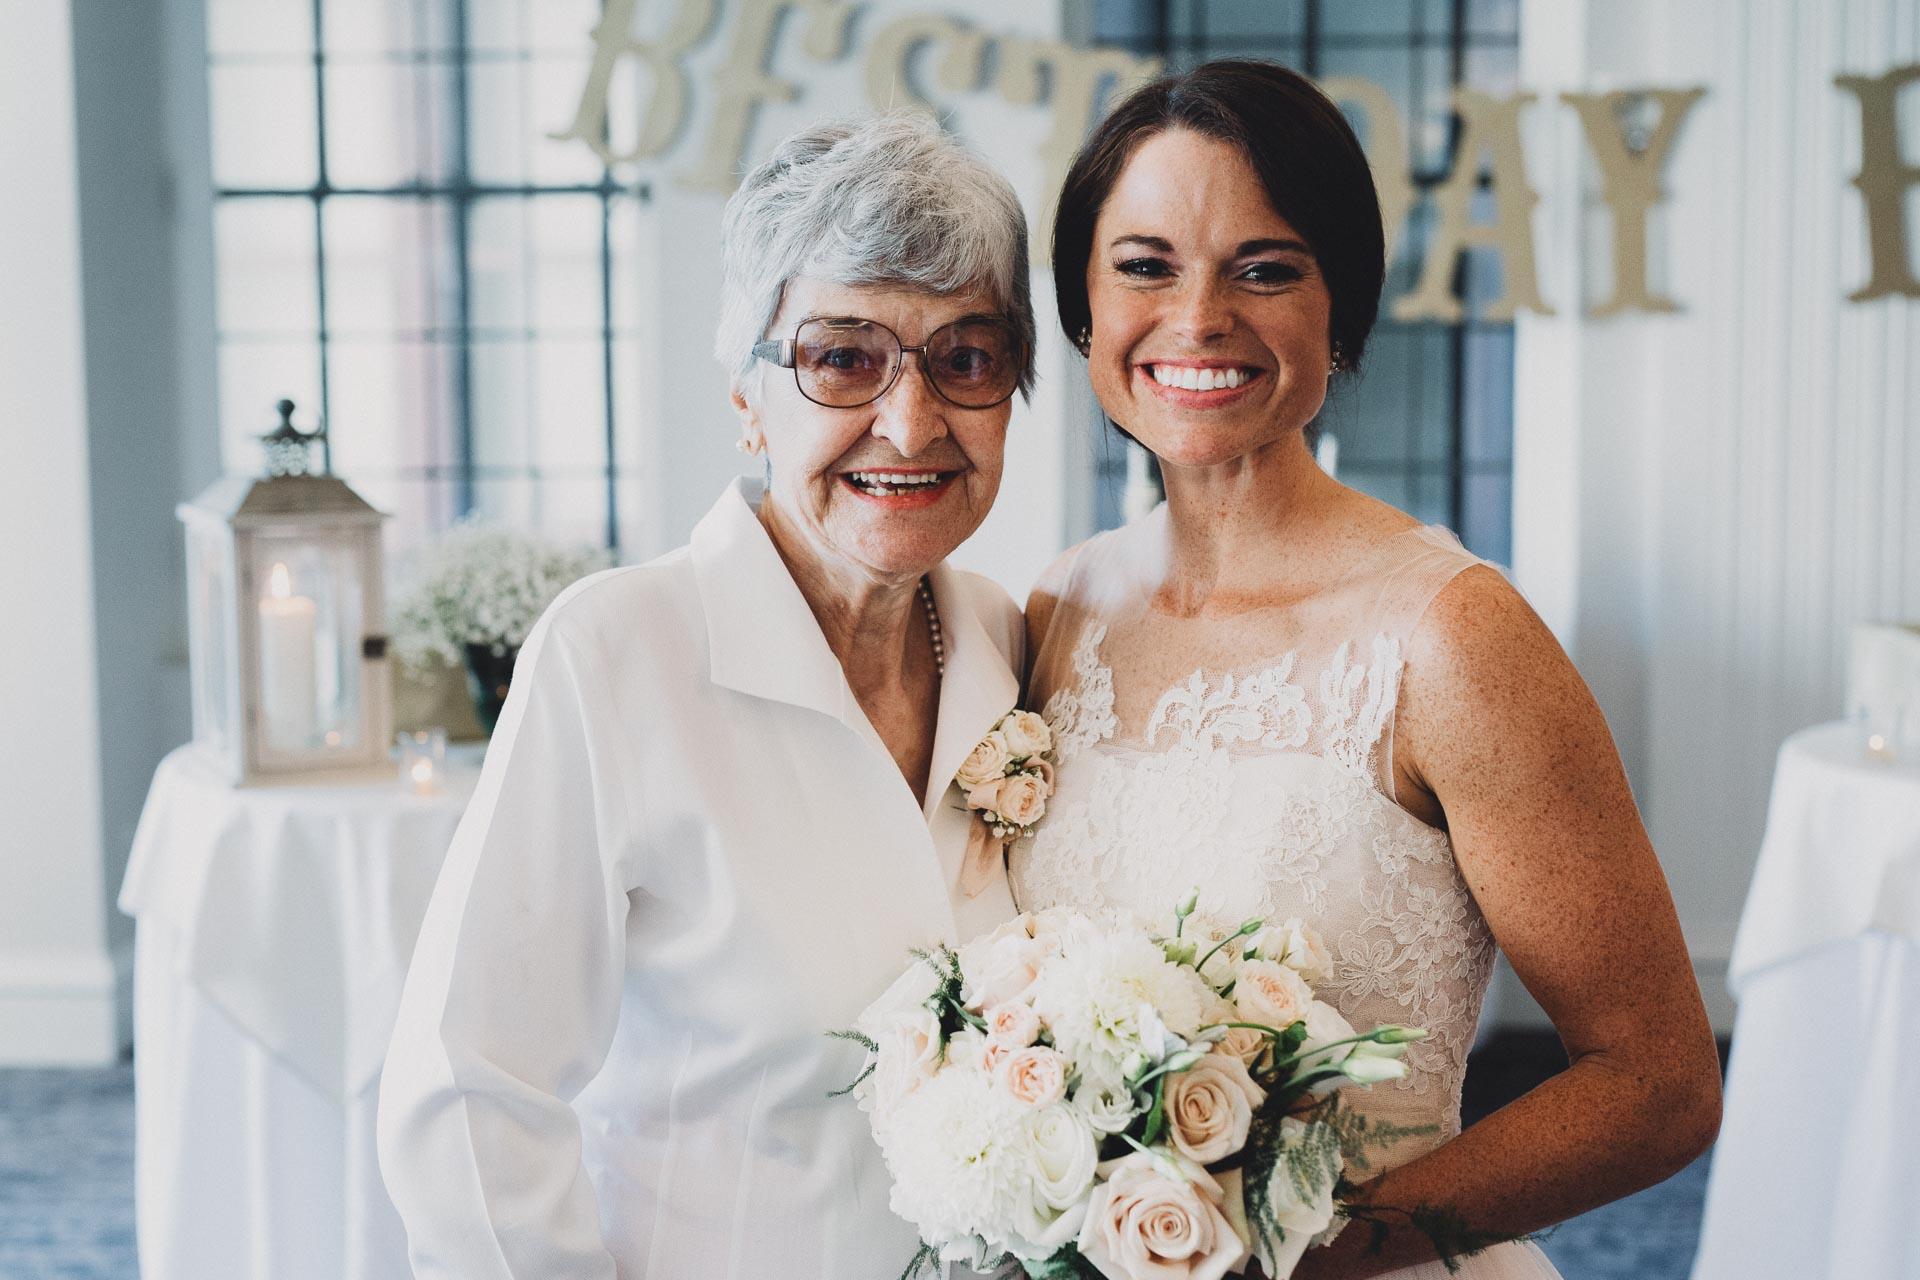 Emily-Eddie-Cincinnati-Rennaissance-Hotel-Wedding-097@2x.jpg